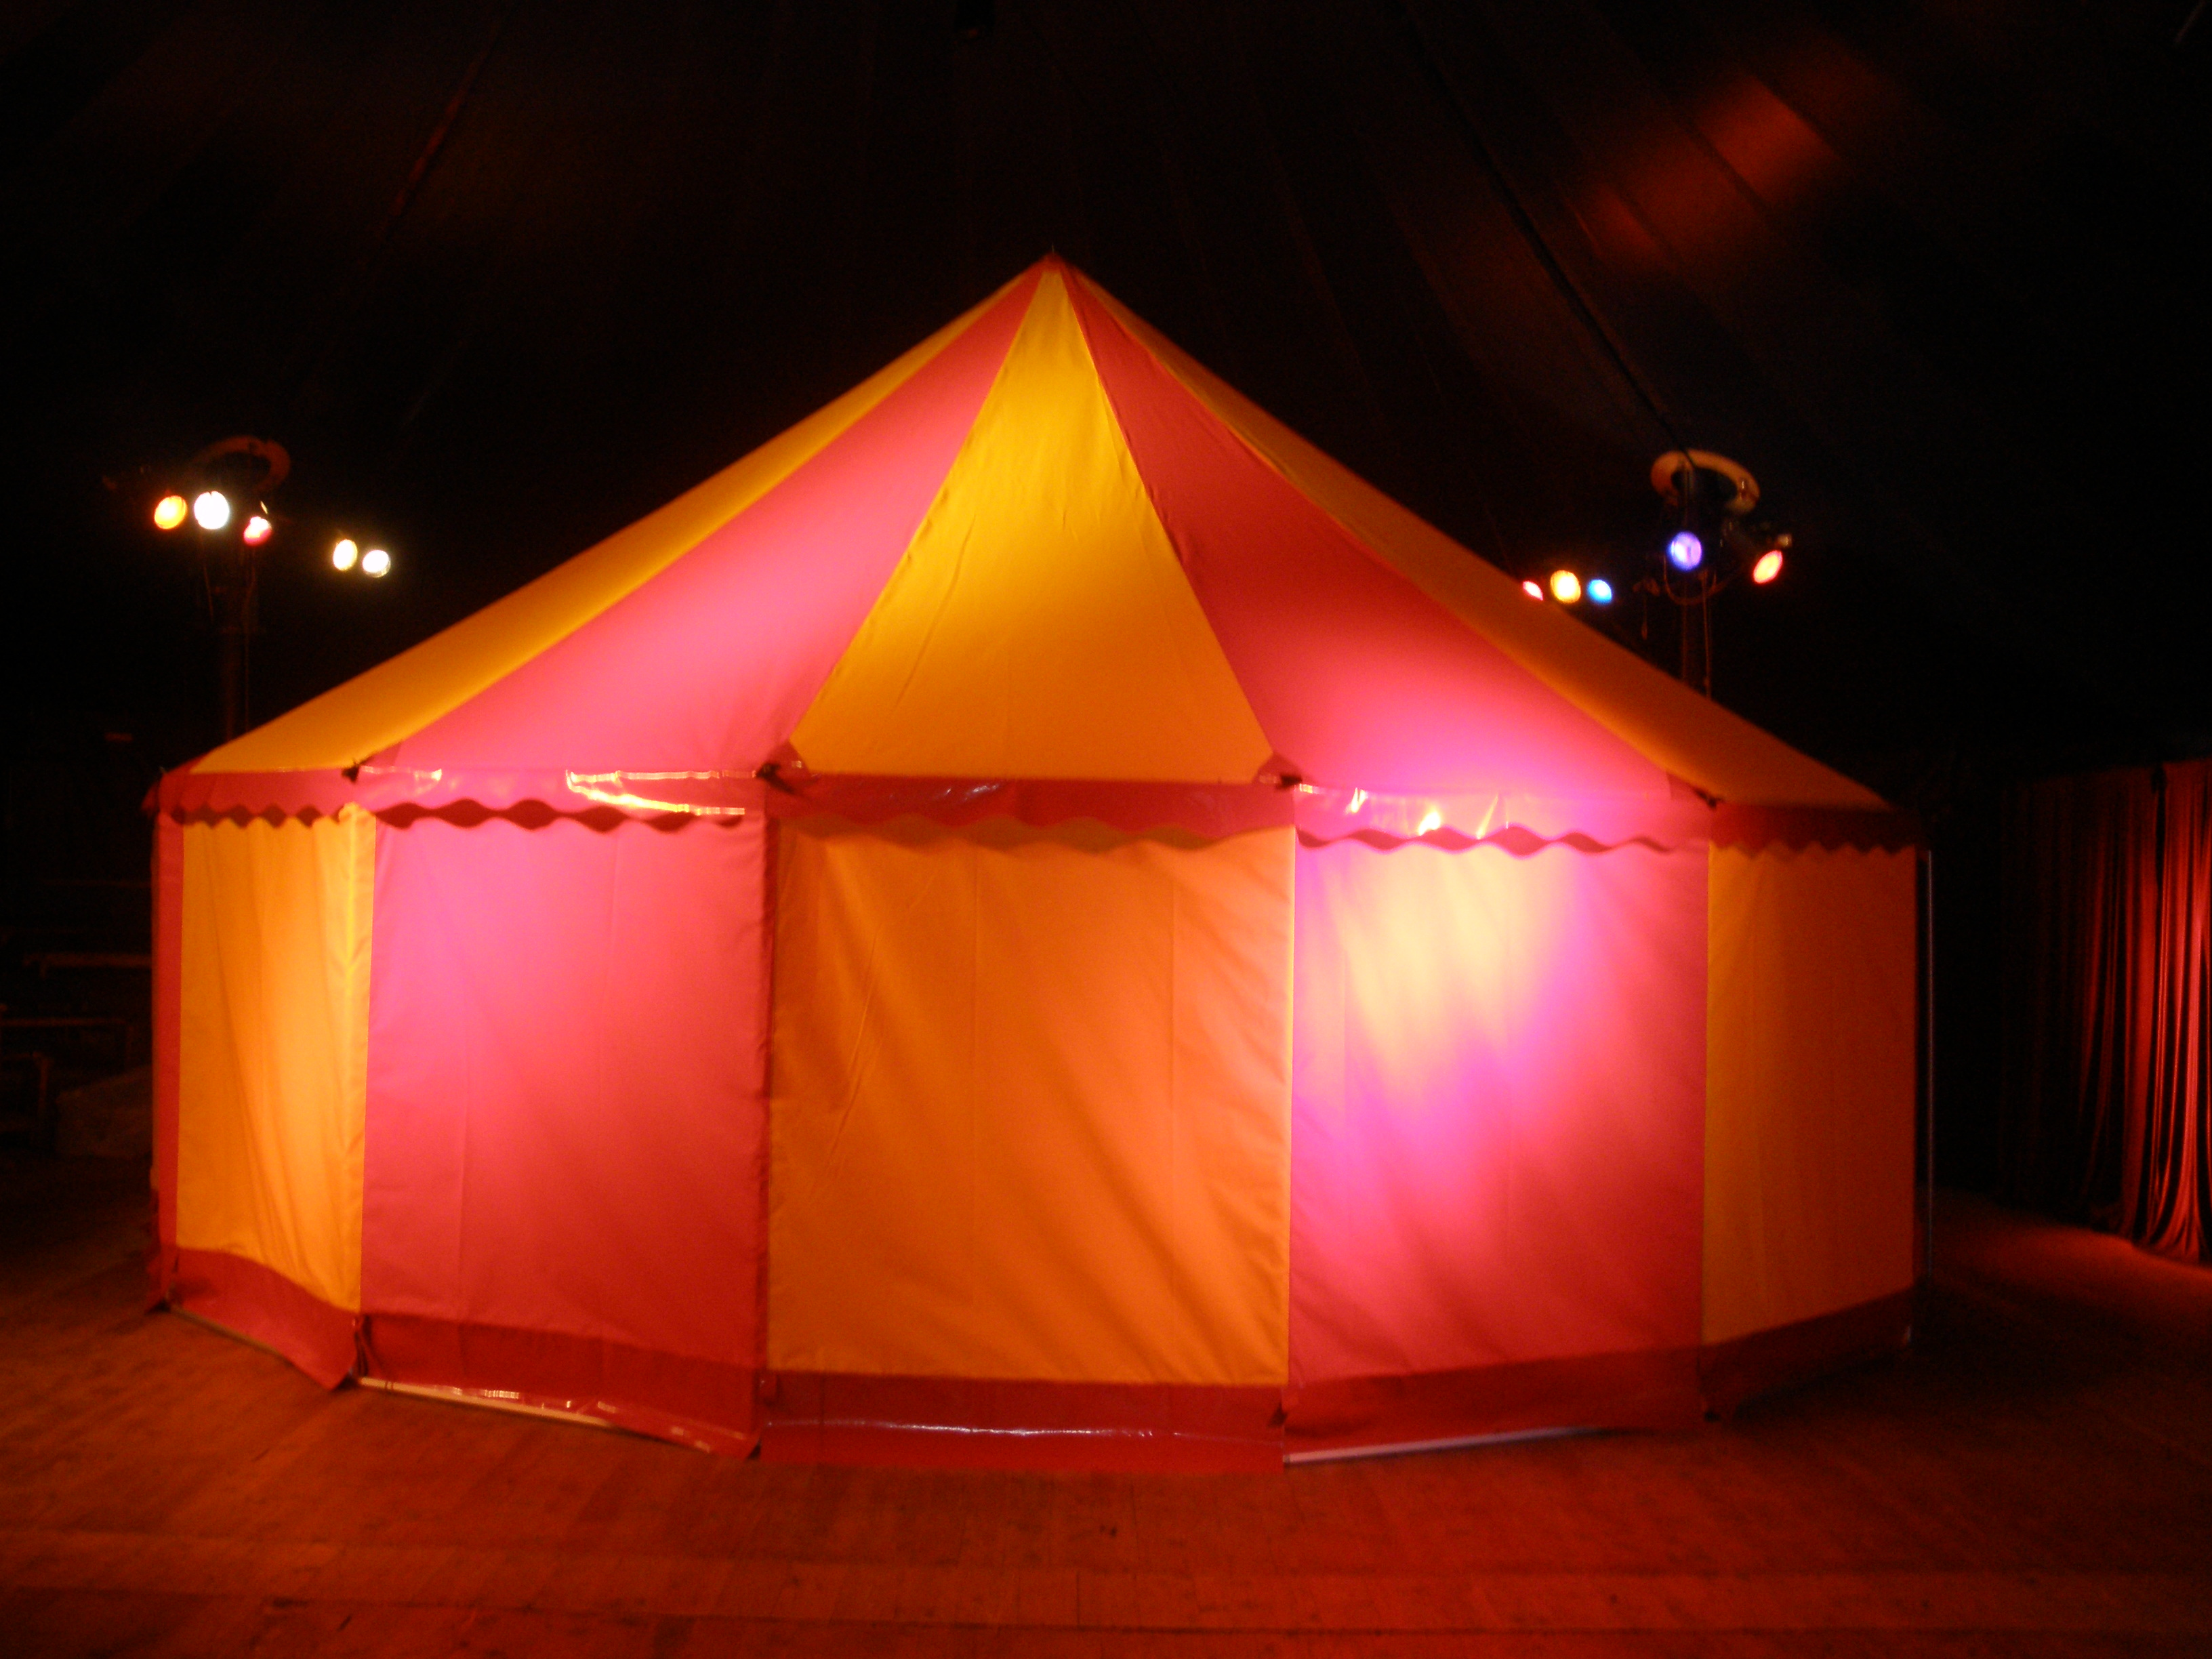 8m-zirkuszelt-Leichtbau-circusevents-koeln-1